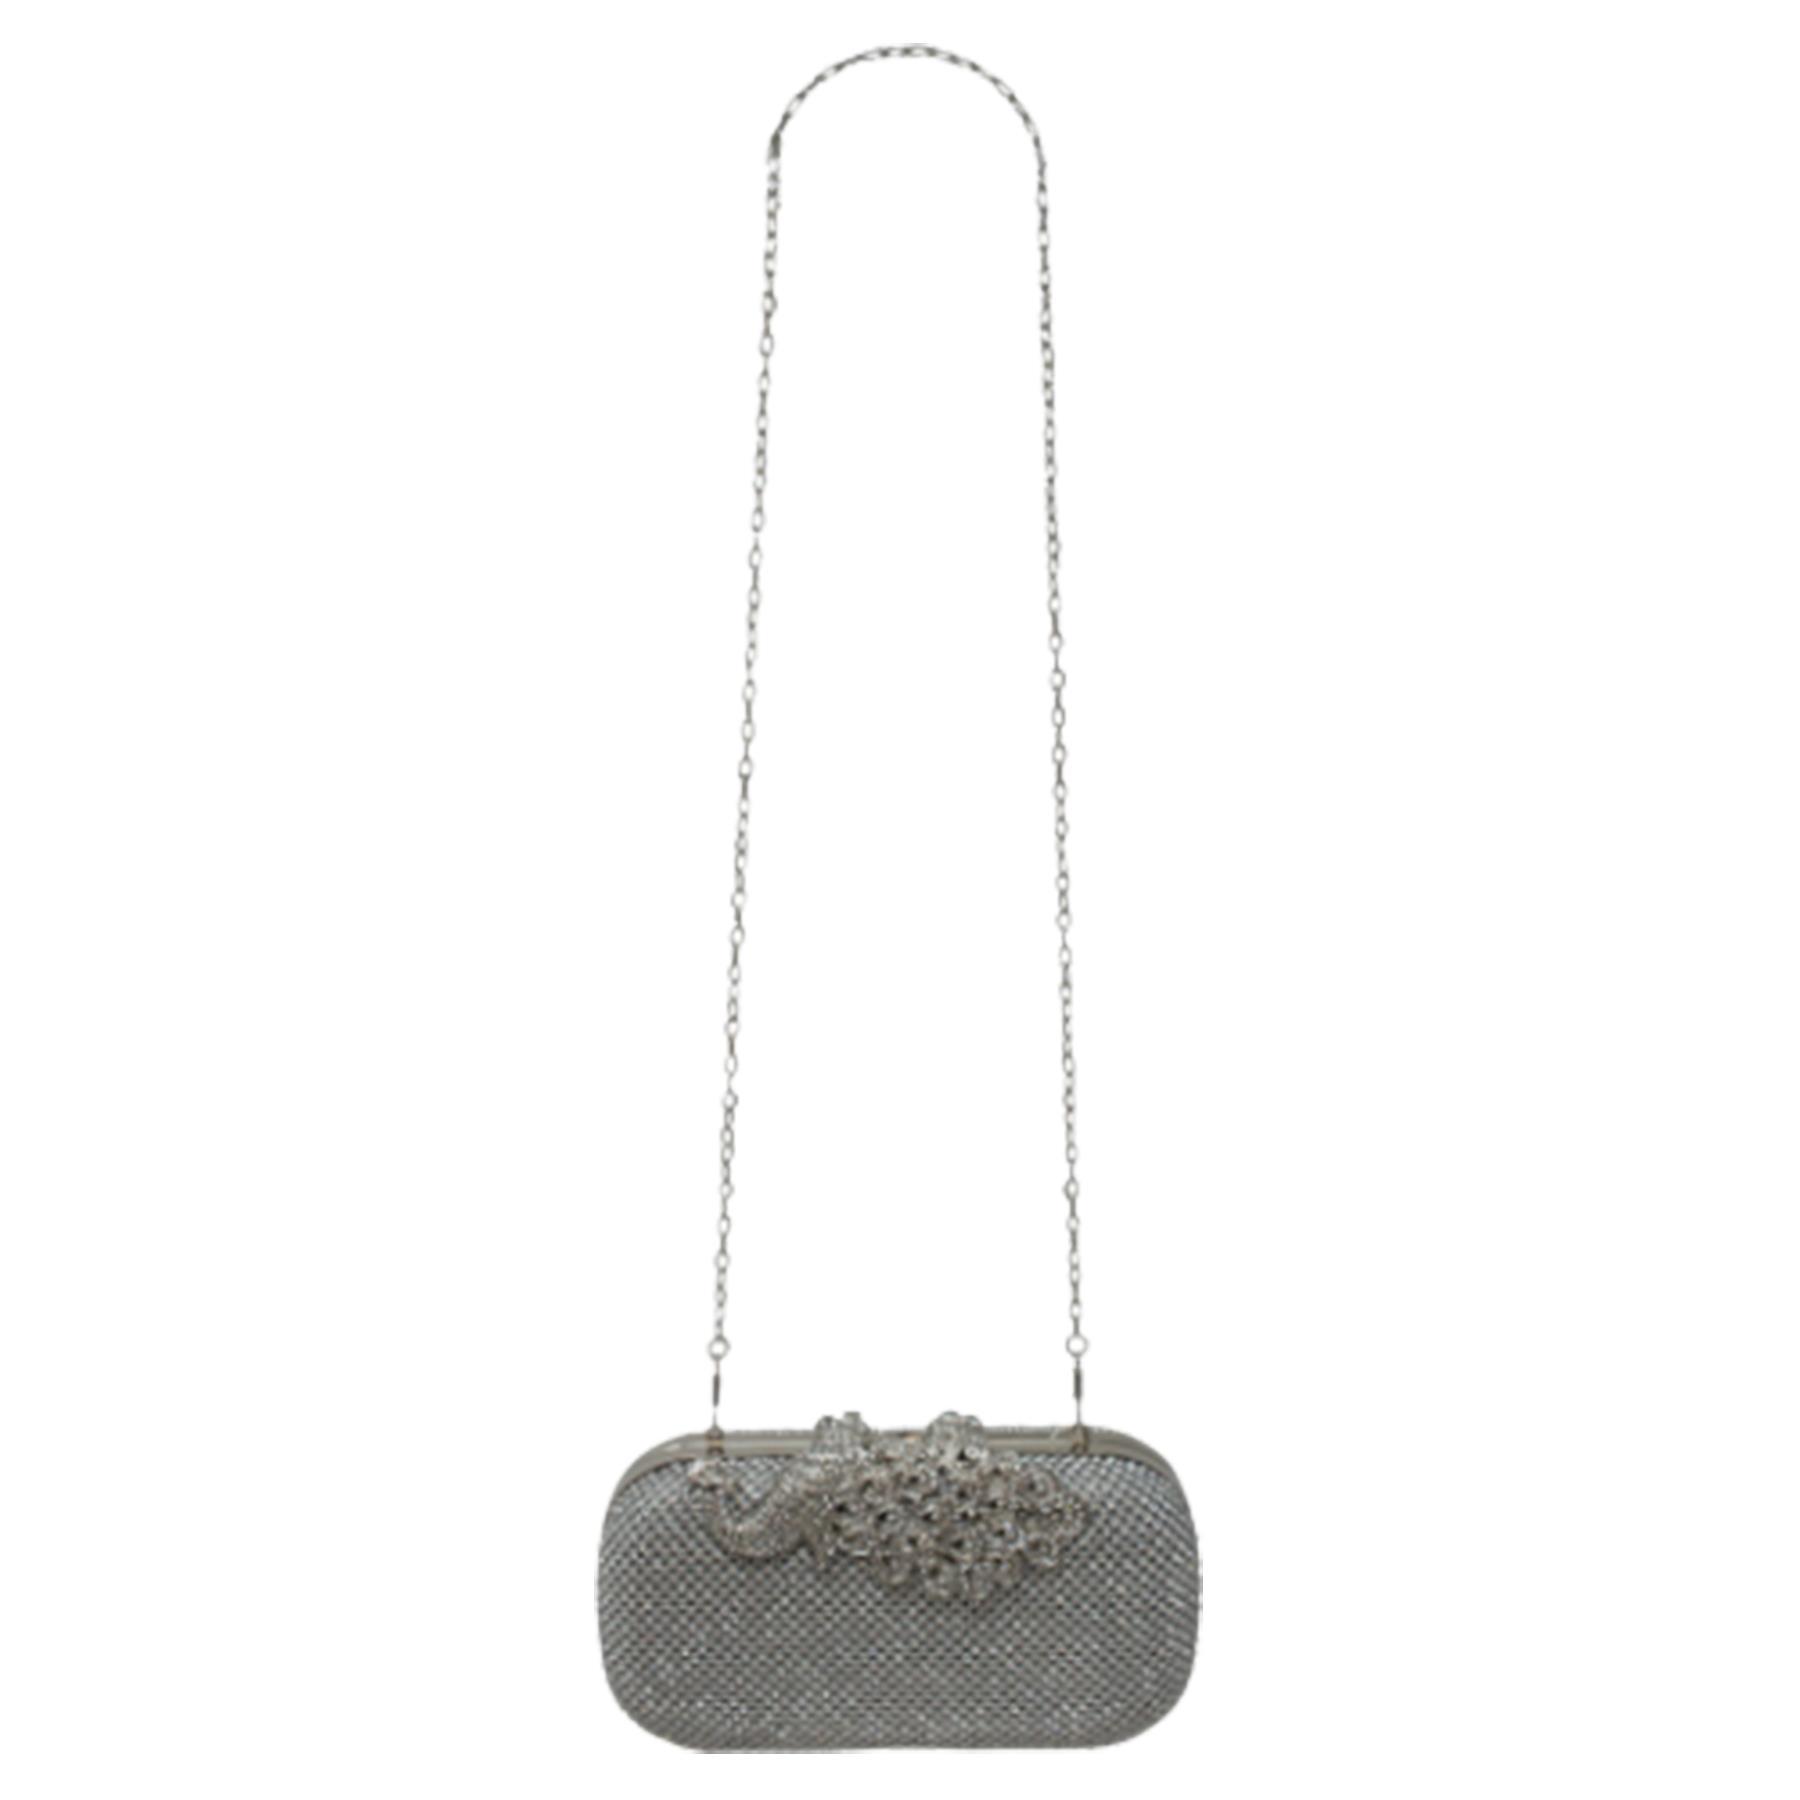 New-Women-s-Jewel-Elephant-Detail-Diamante-Chain-Box-Clutch-Bag-Purse thumbnail 16